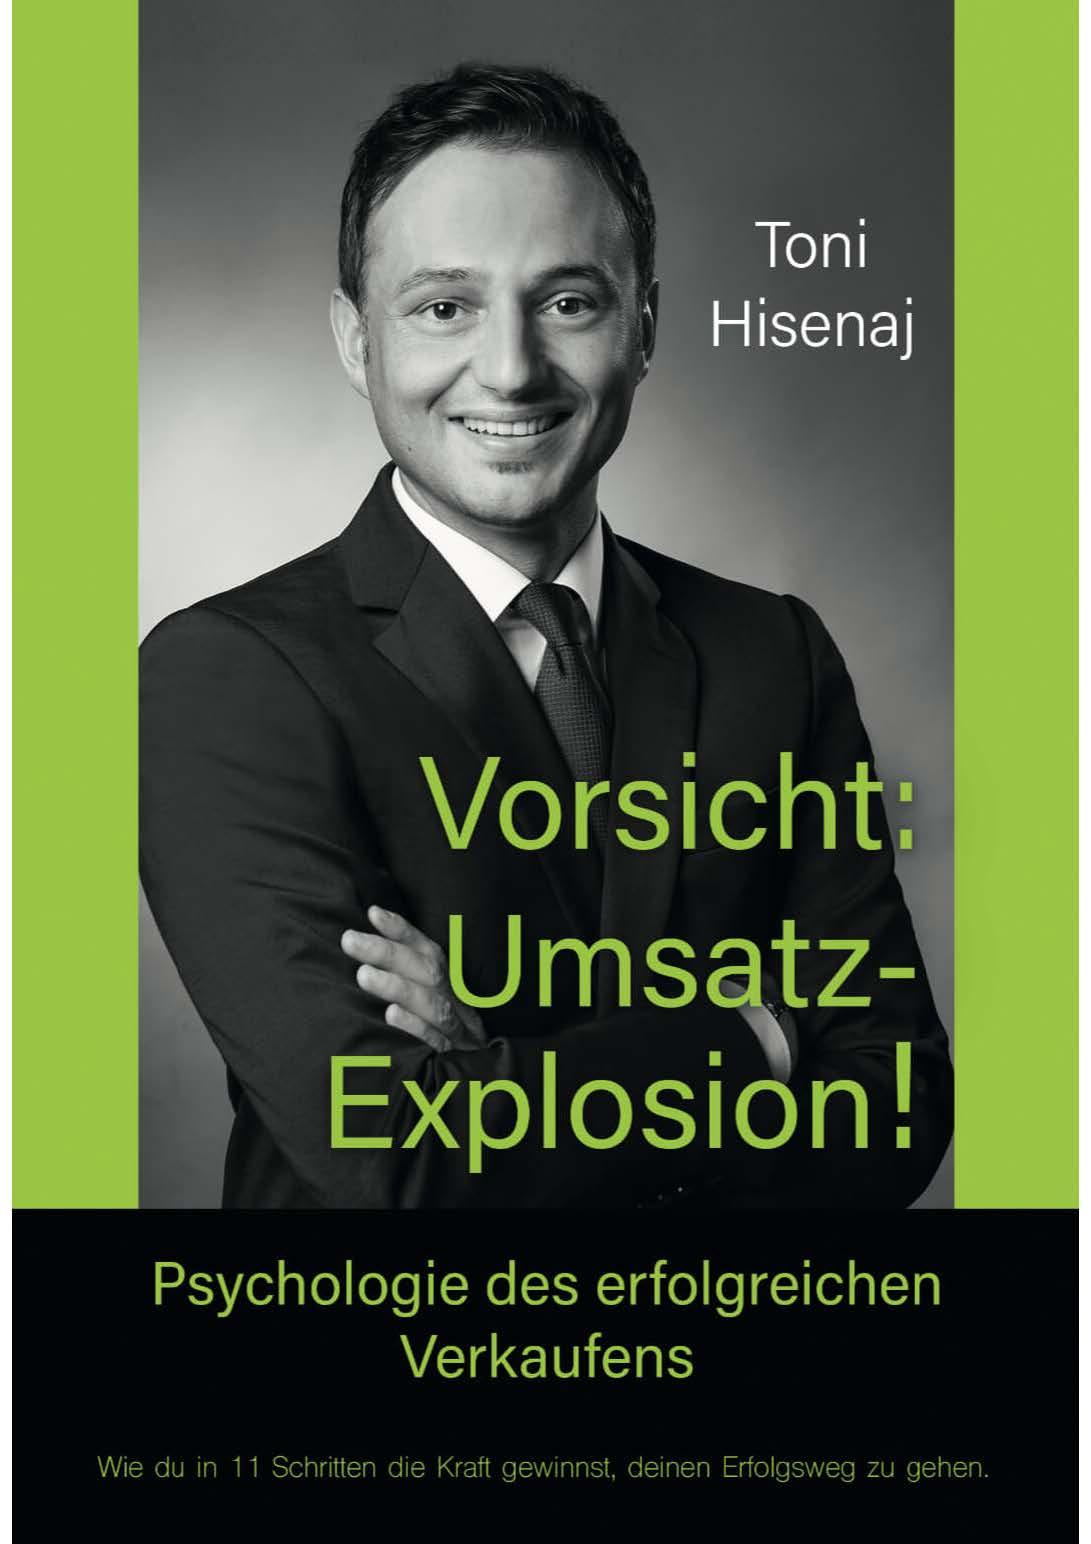 Expert Marketplace - Toni Hisenaj  - Vorsicht: Umsatz-Explosion!